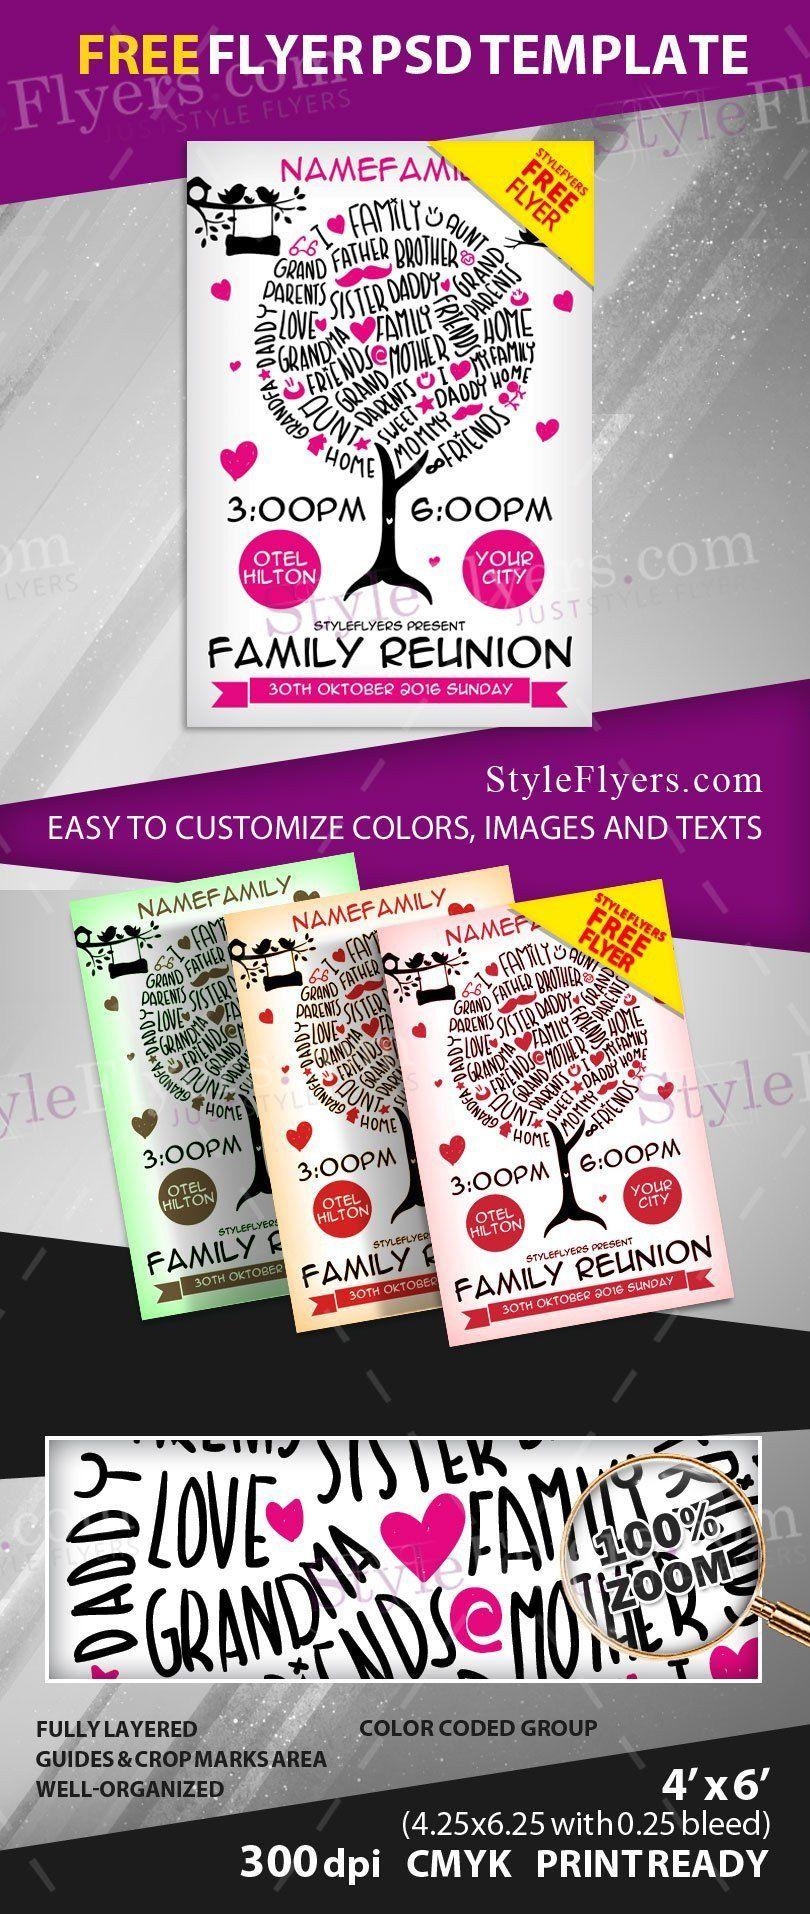 Family Reunion Flyer Templates Family Reunion Free Psd Flyer Template Free Download Free Psd Flyer Templates Psd Flyer Templates Free Psd Flyer